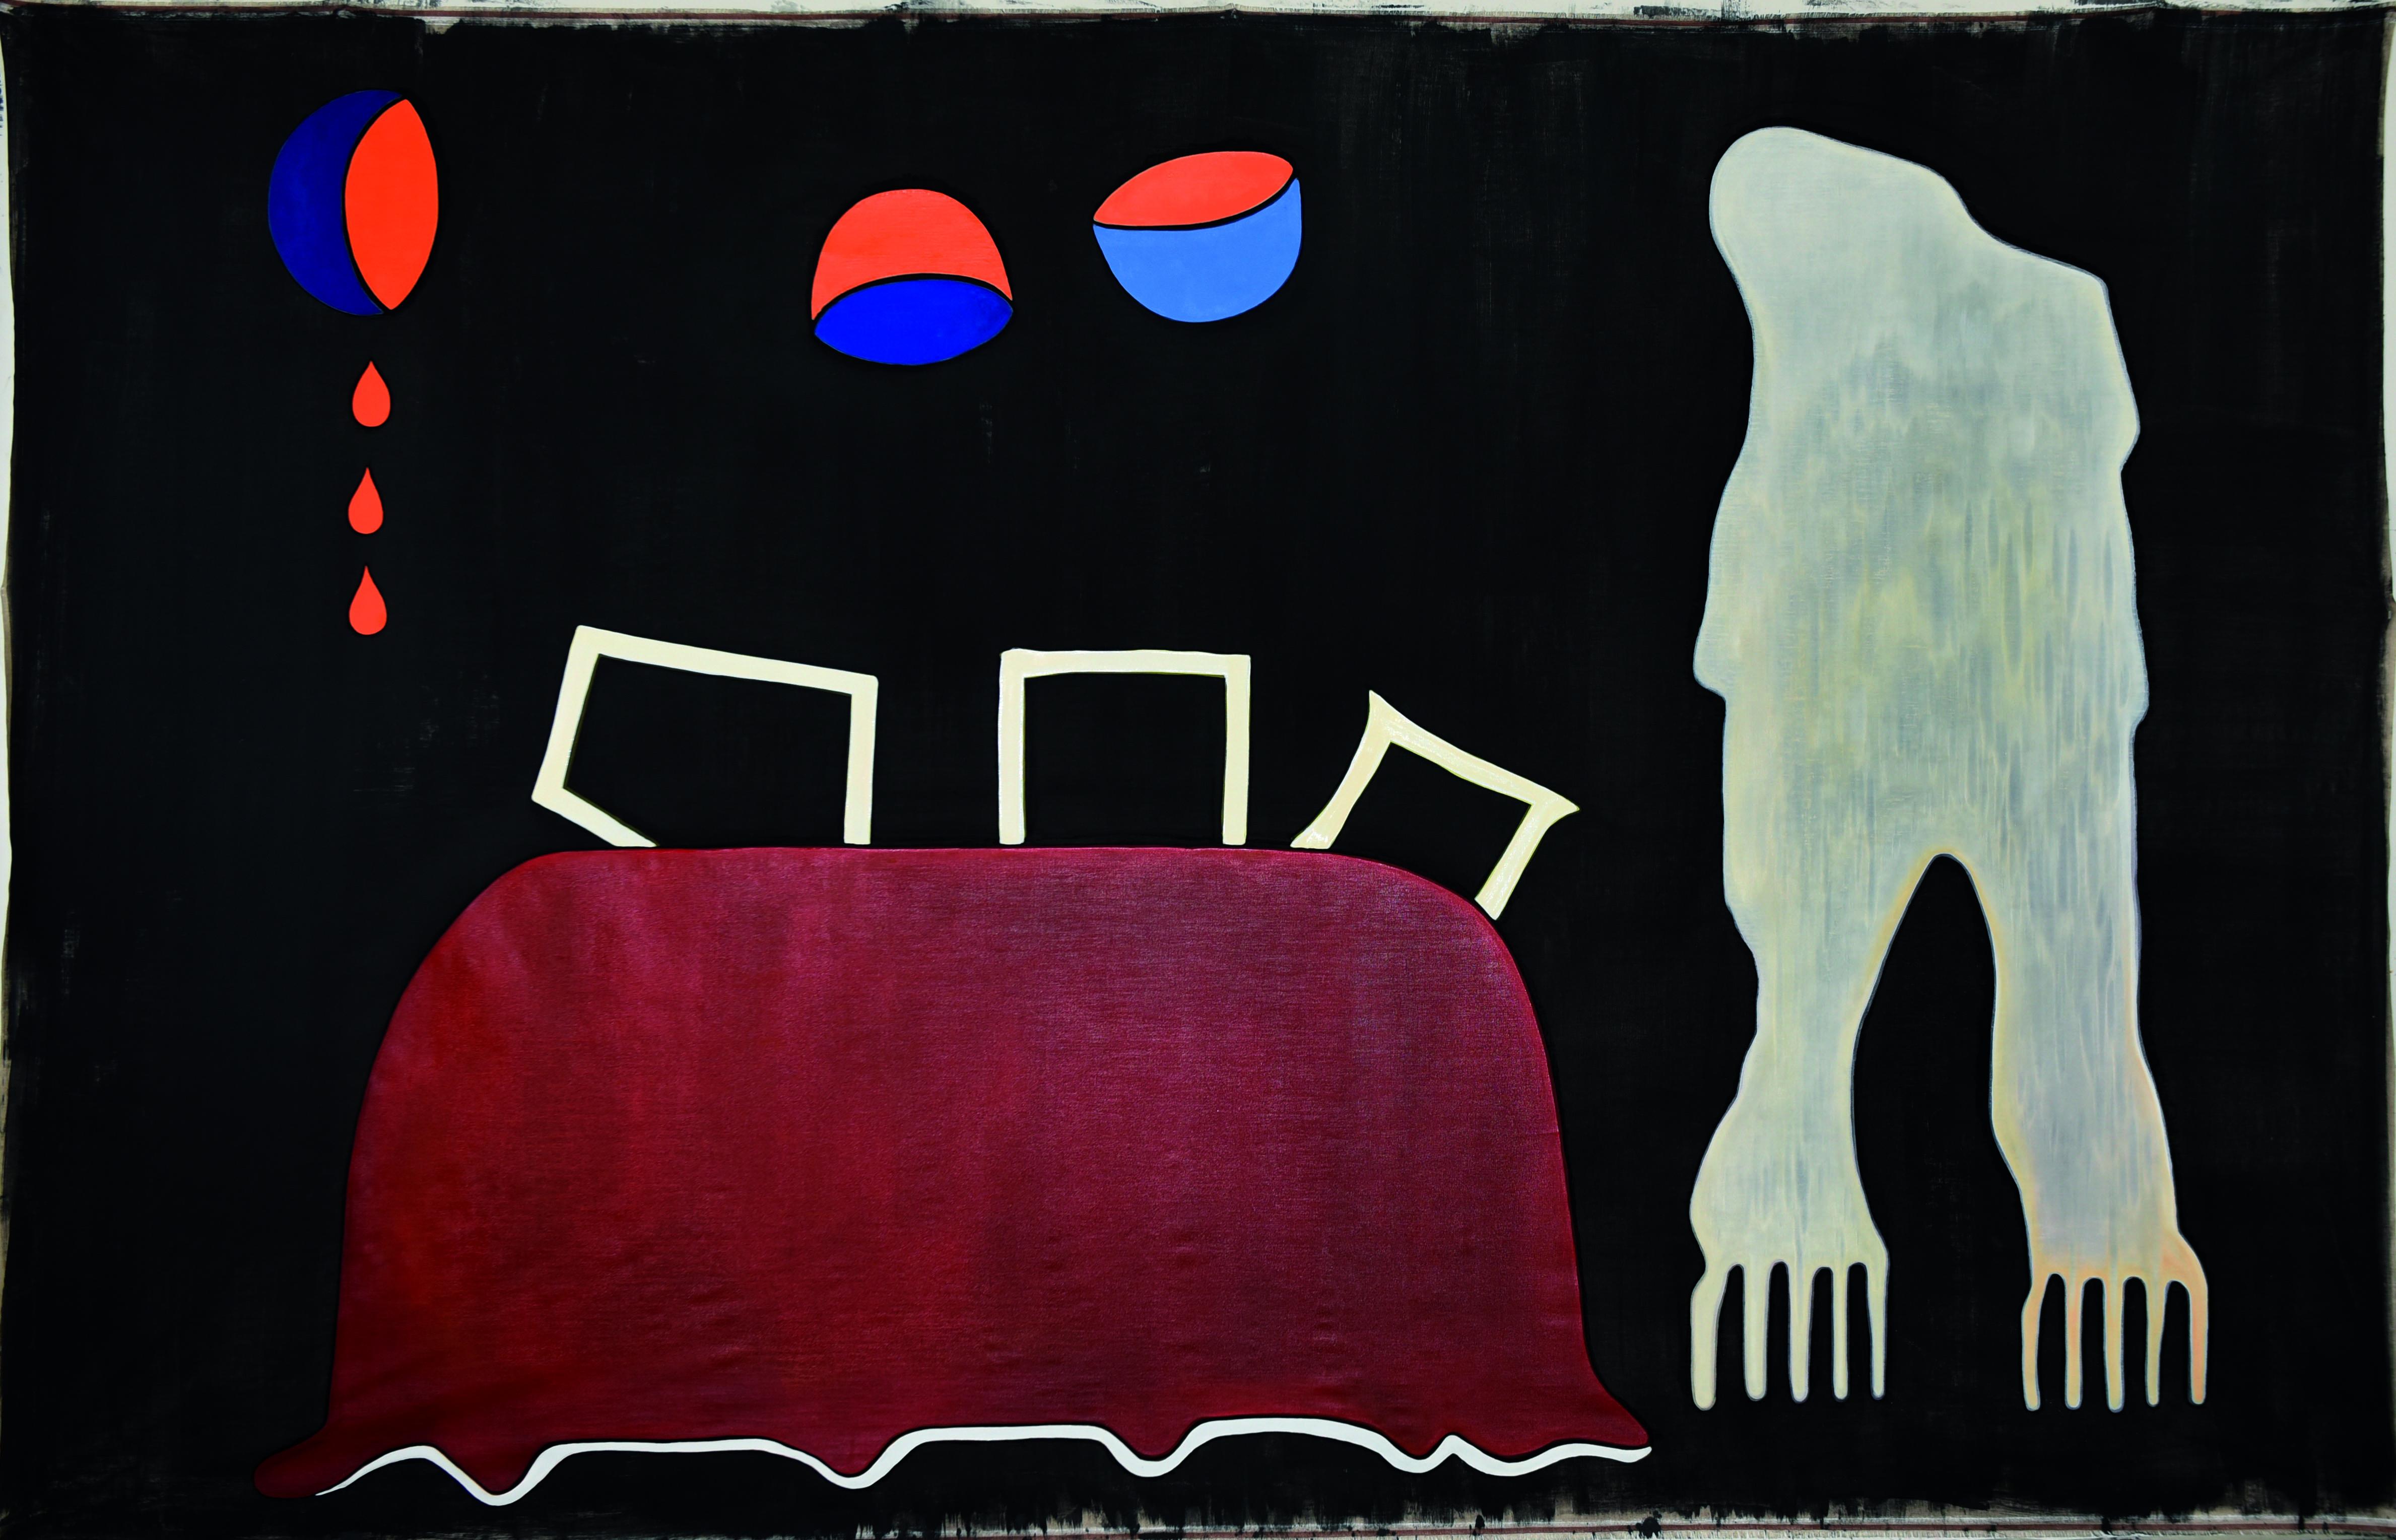 Inka ter Haar, The Garden, Öl auf Leinen, 2019